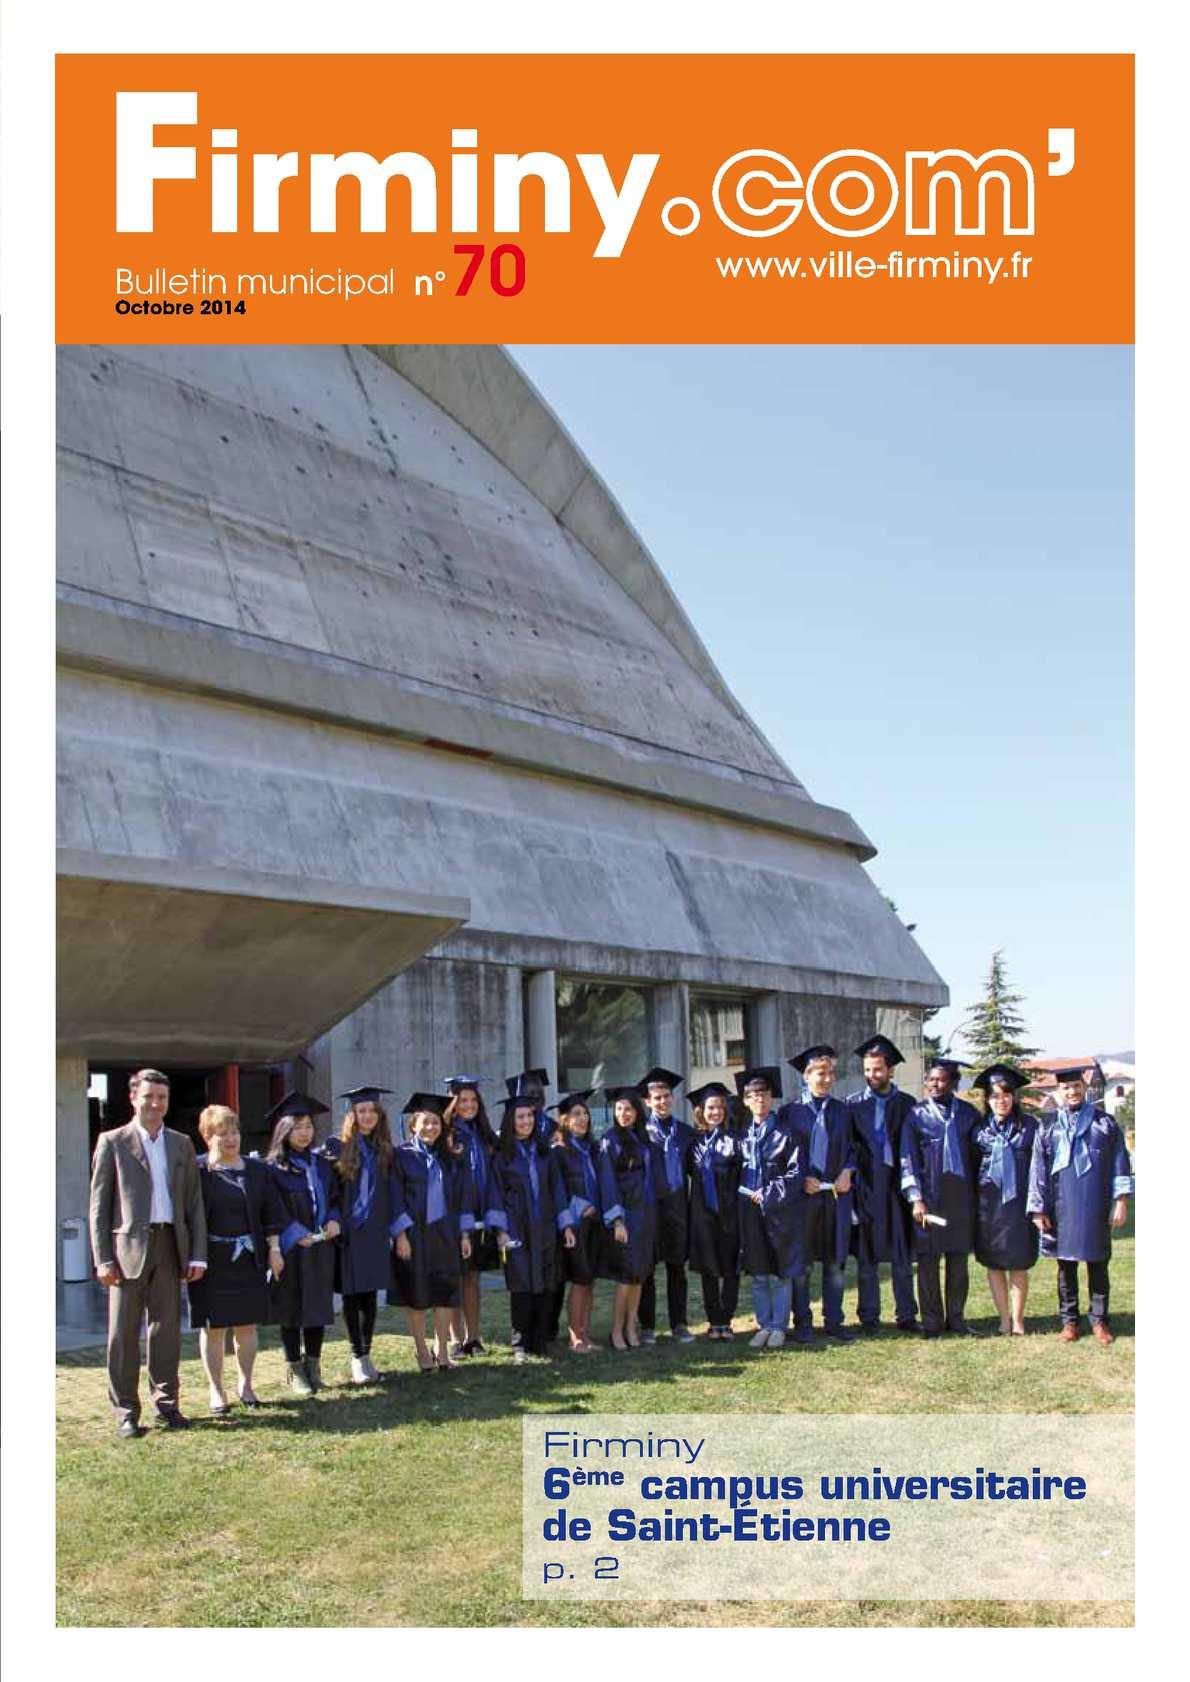 Calaméo - Bulletin Municipal N°70 encequiconcerne Piscine Discount Firminy